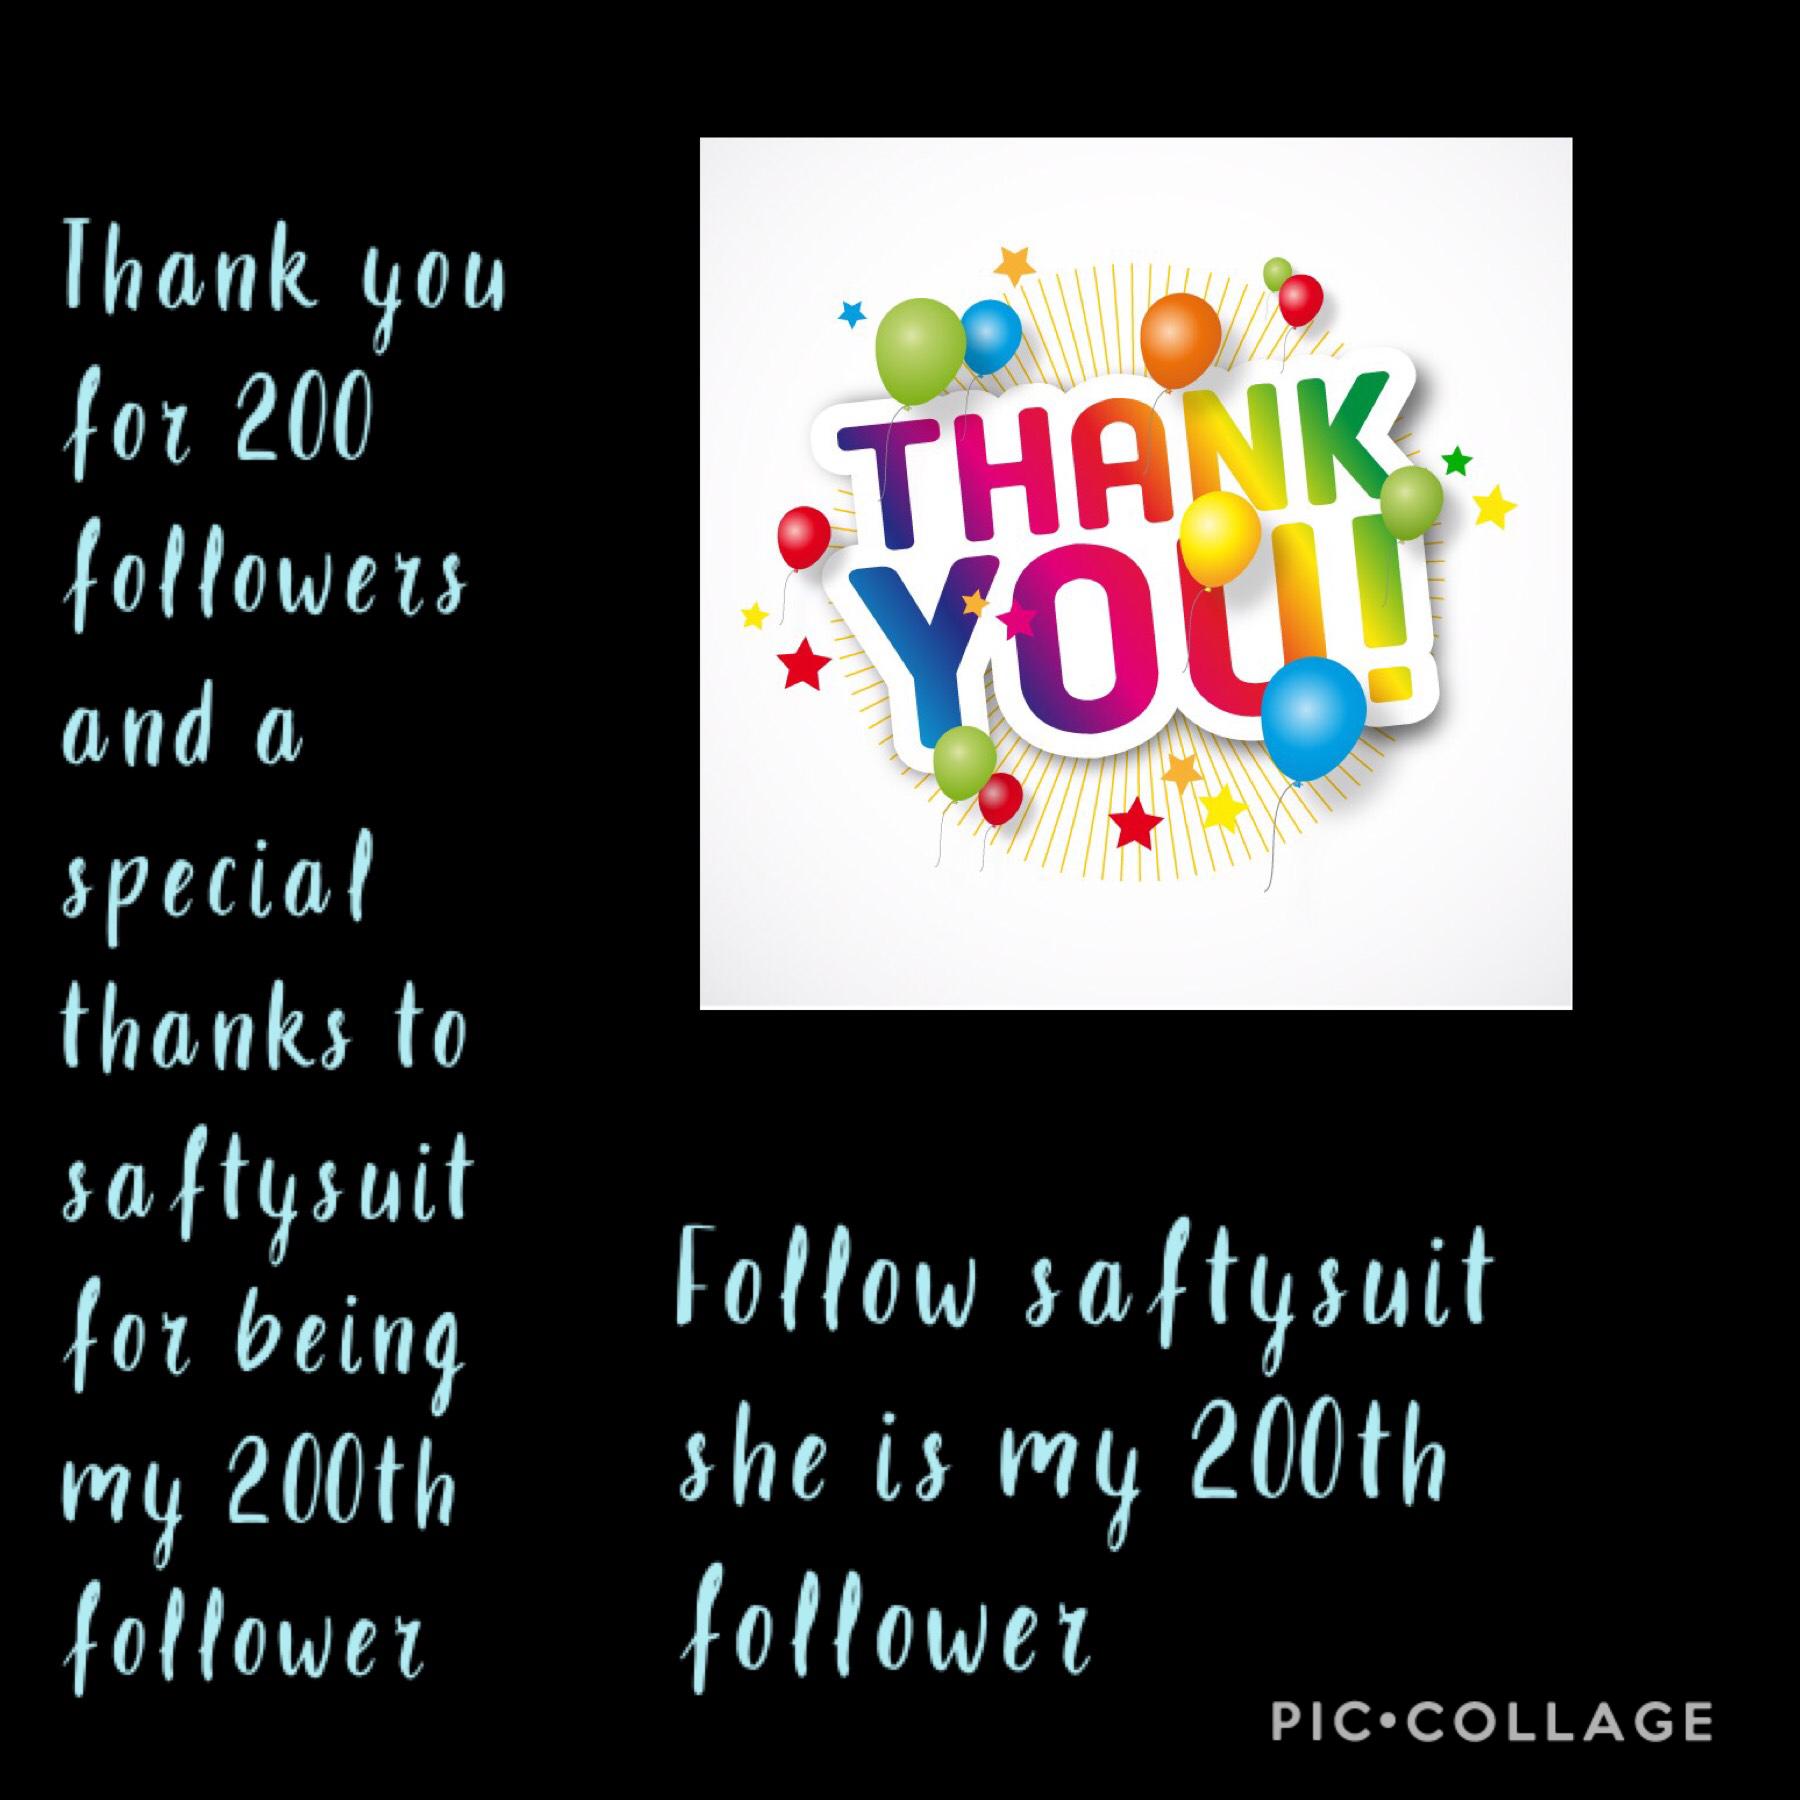 200 followers!!!!